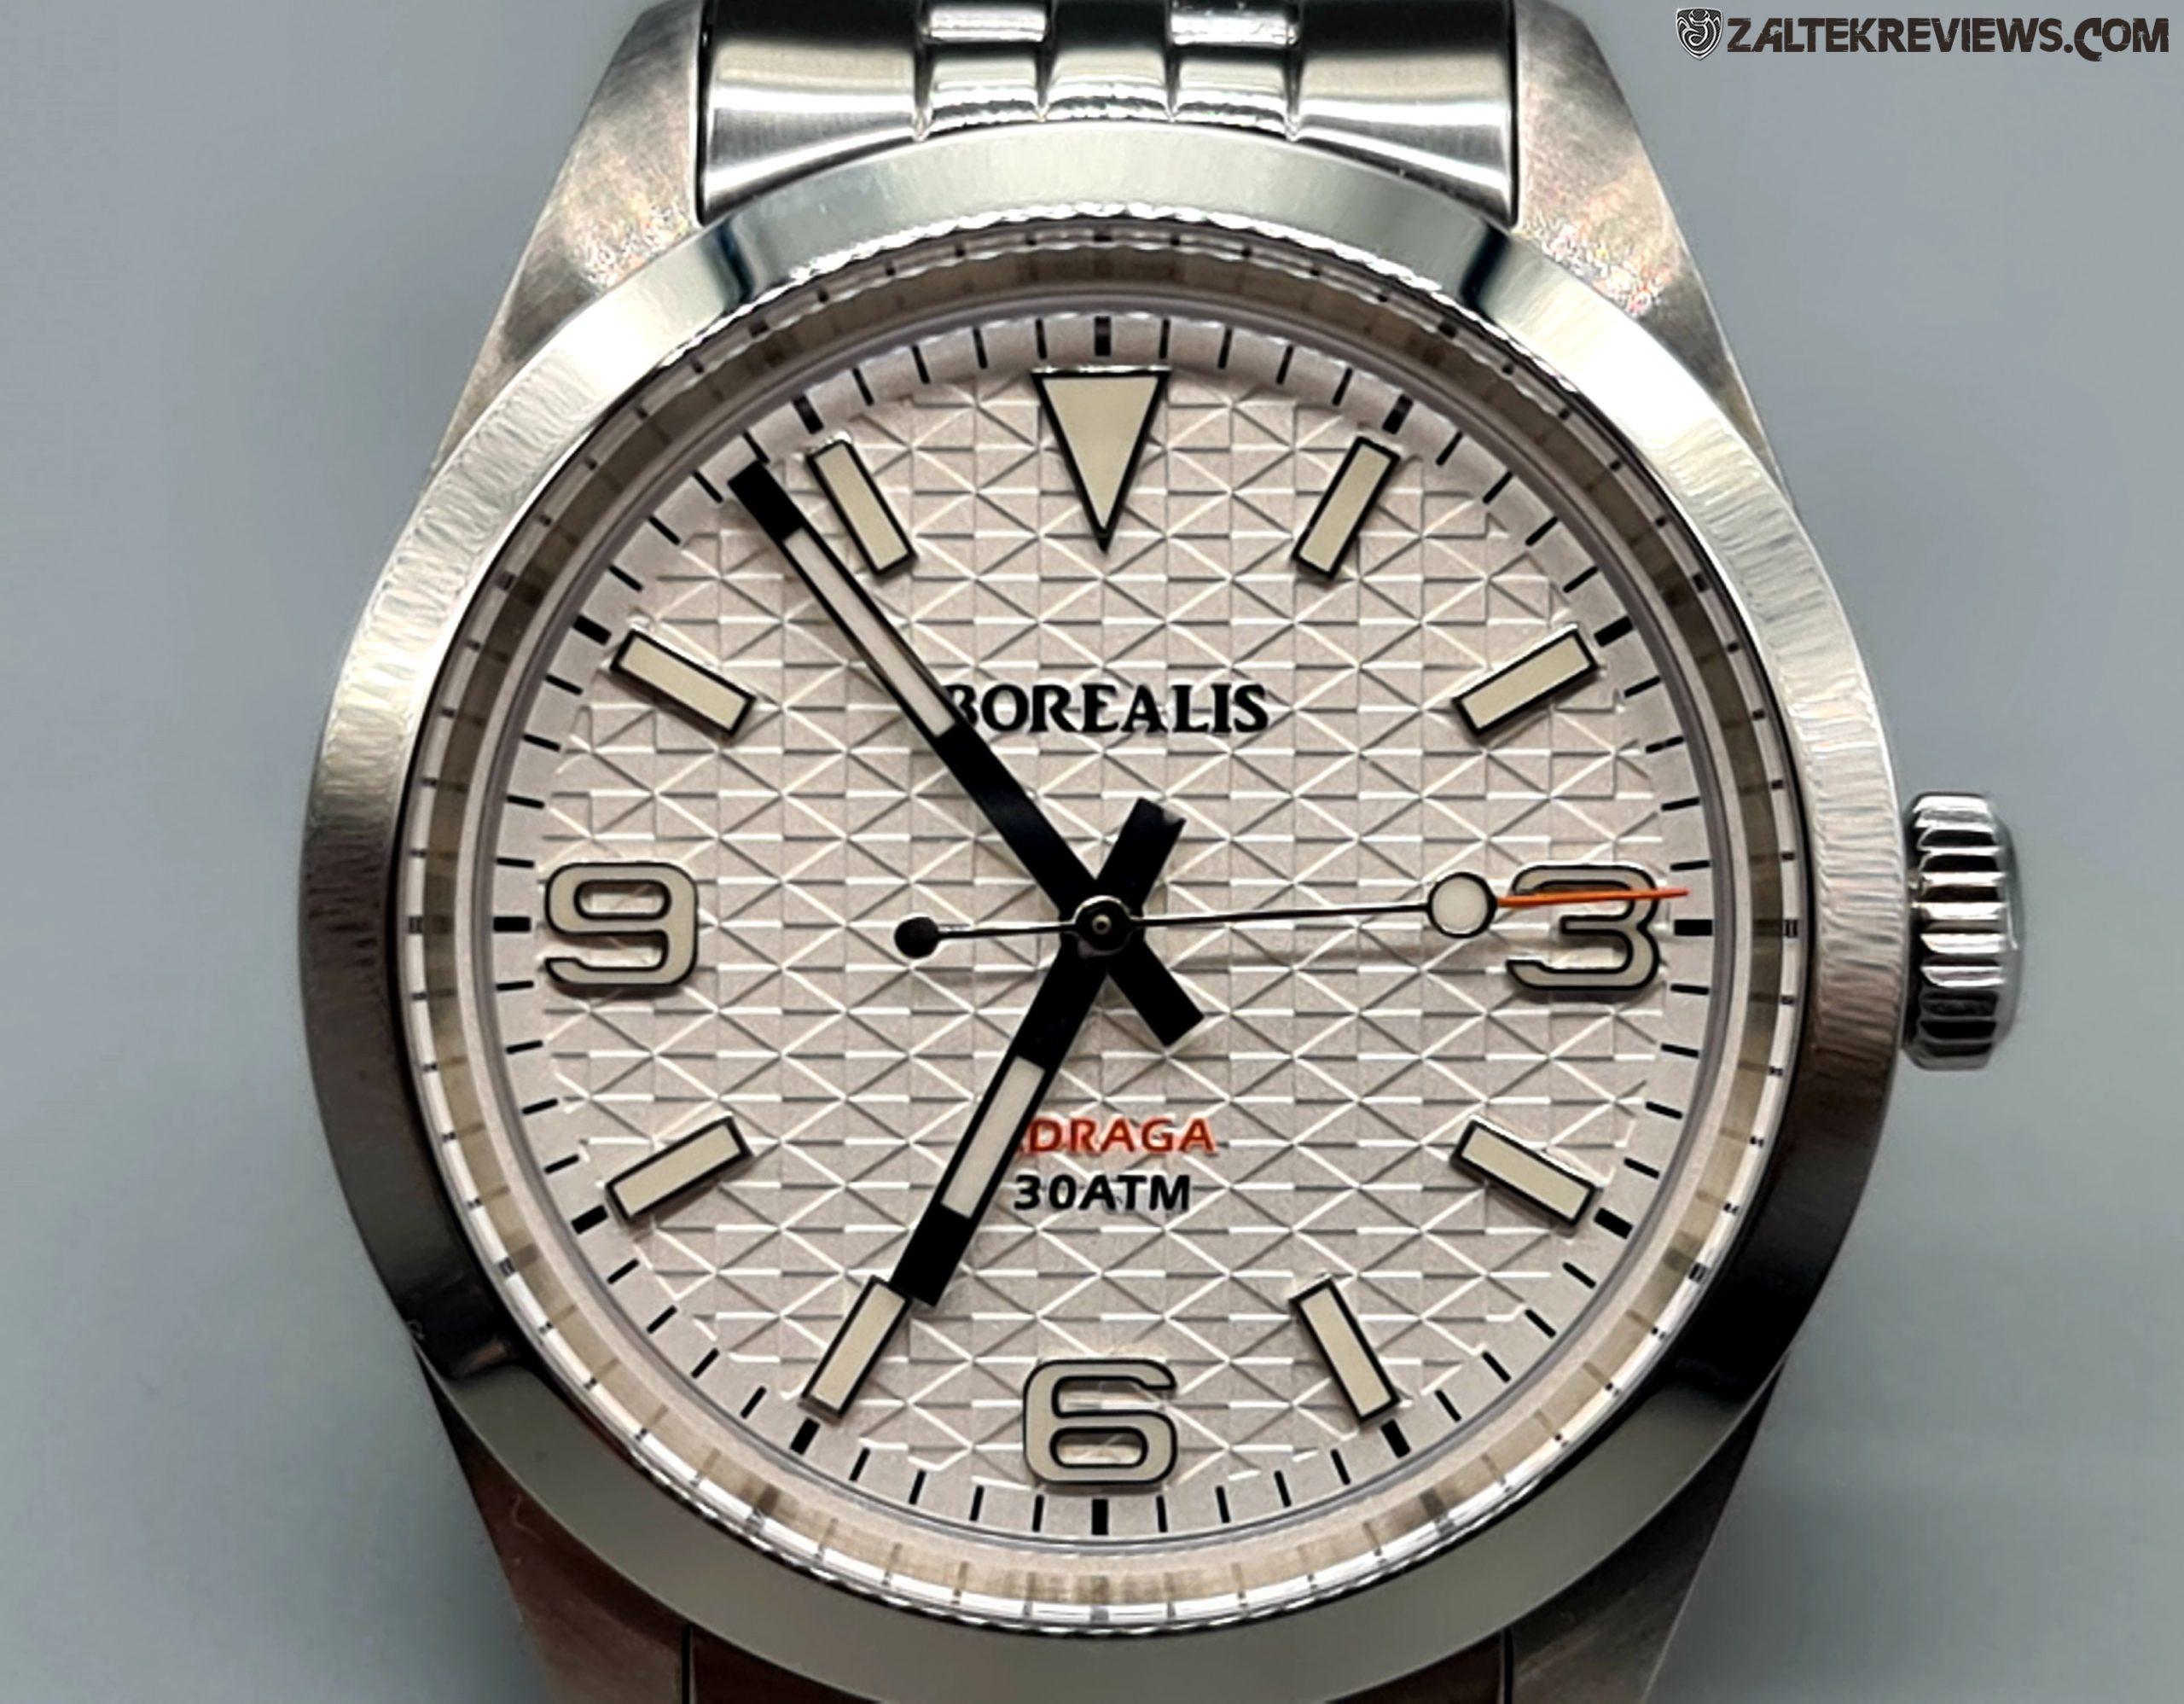 Borealis Adraga v2 Review